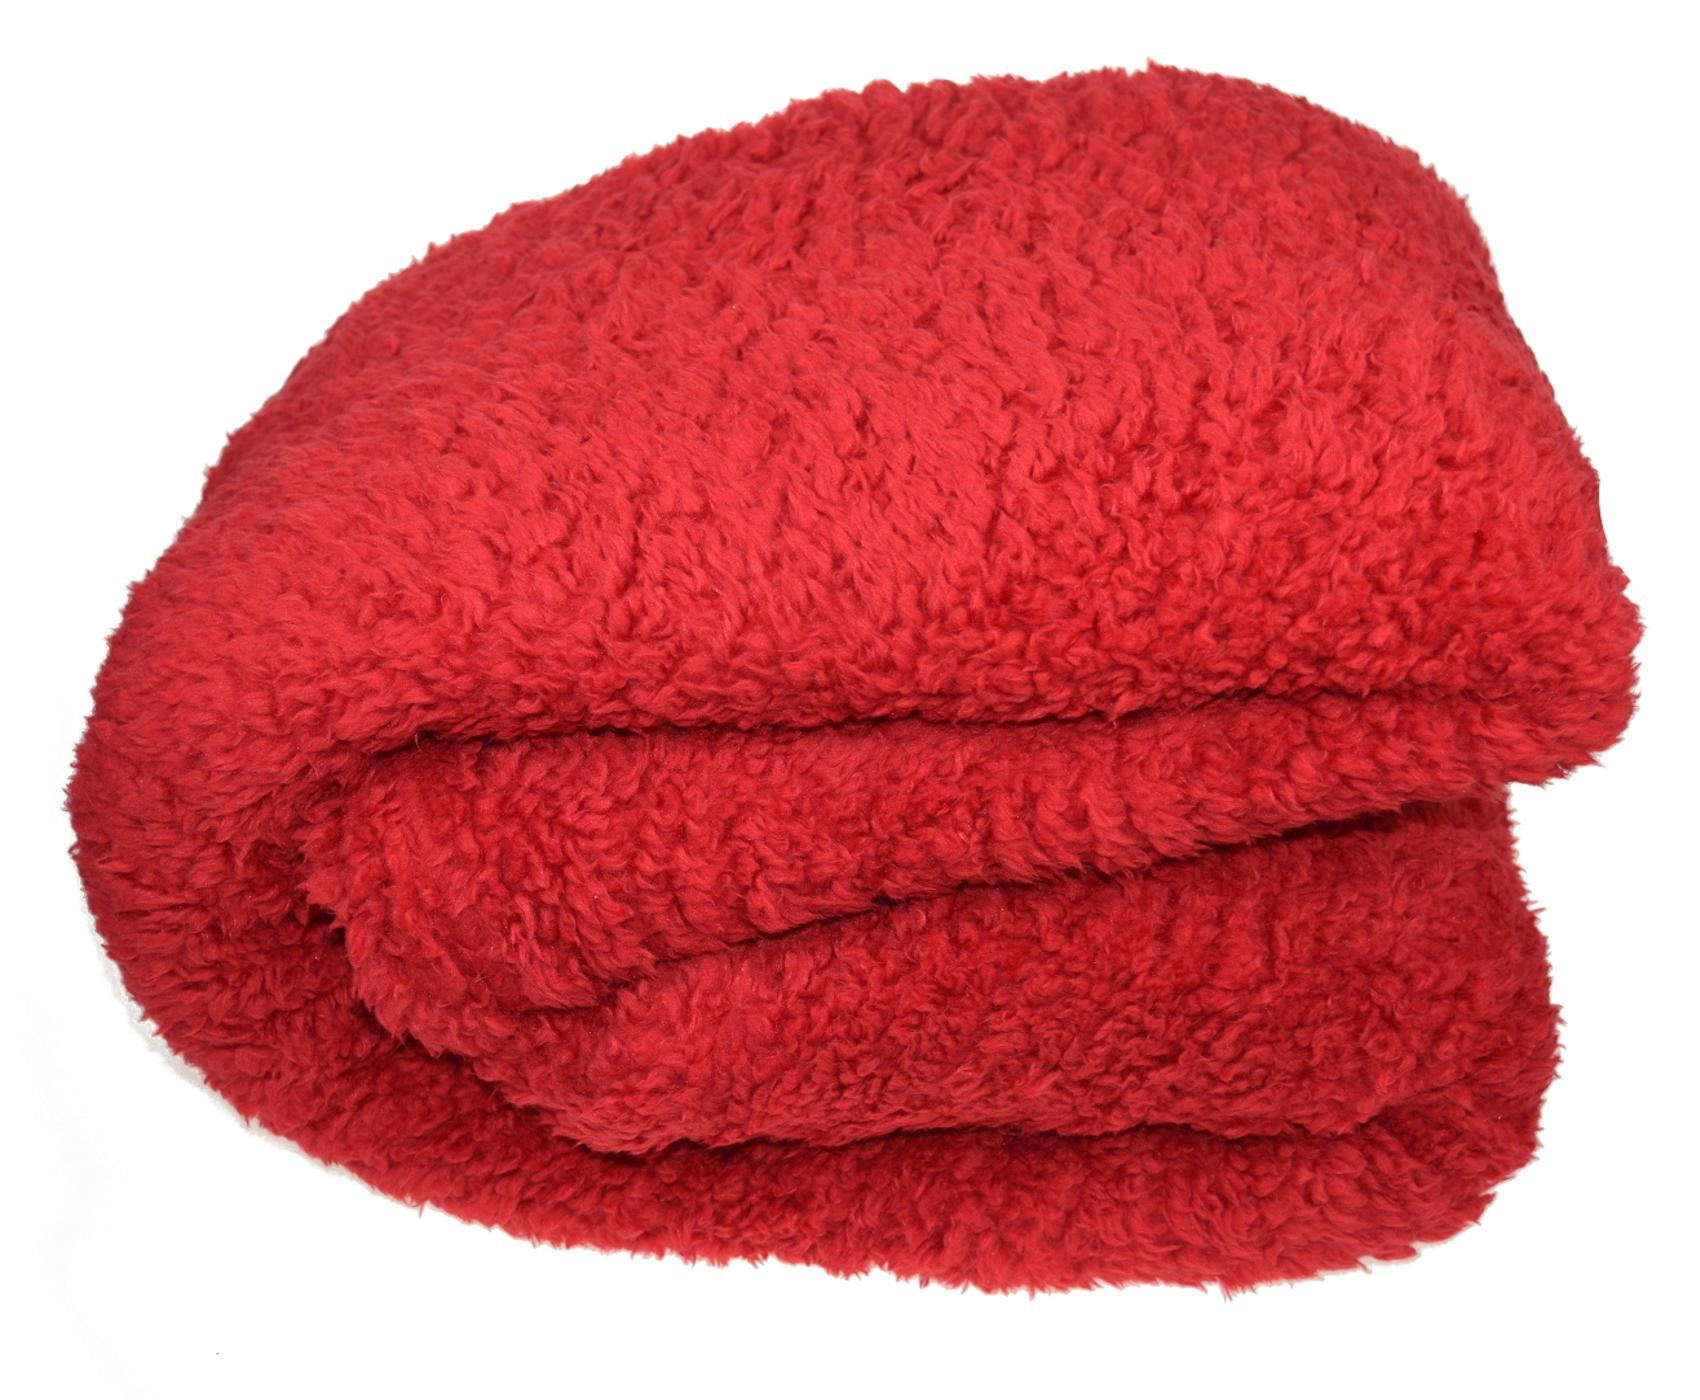 Super Soft Teddy Fleece Blanket Cosy Sofa Bed